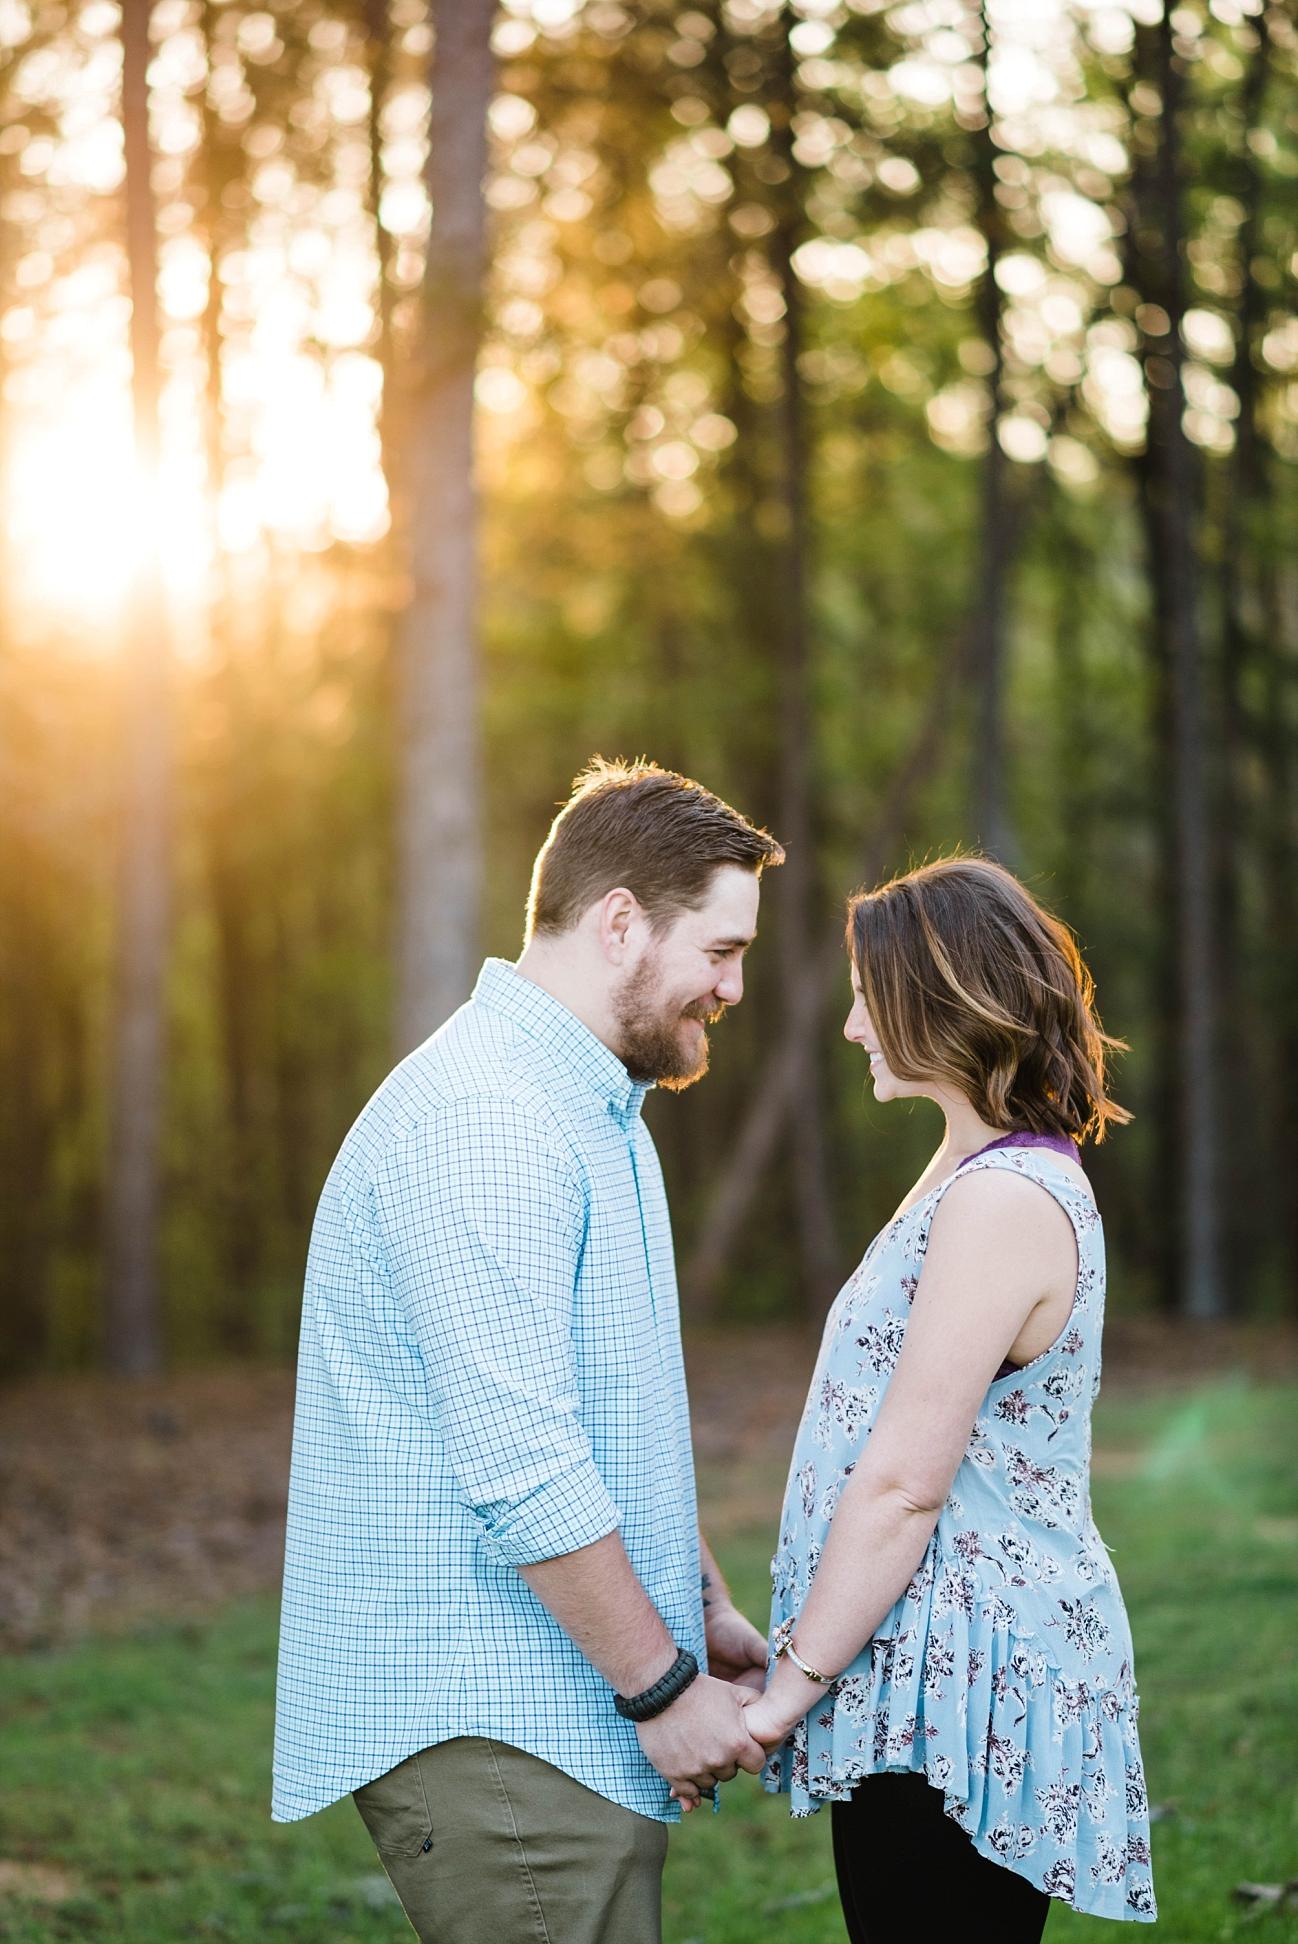 SPRING ENGAGEMENT SESSION|RUSTY & MORGAN | BIG OAK RANCH | SPRINGVILLE, AL